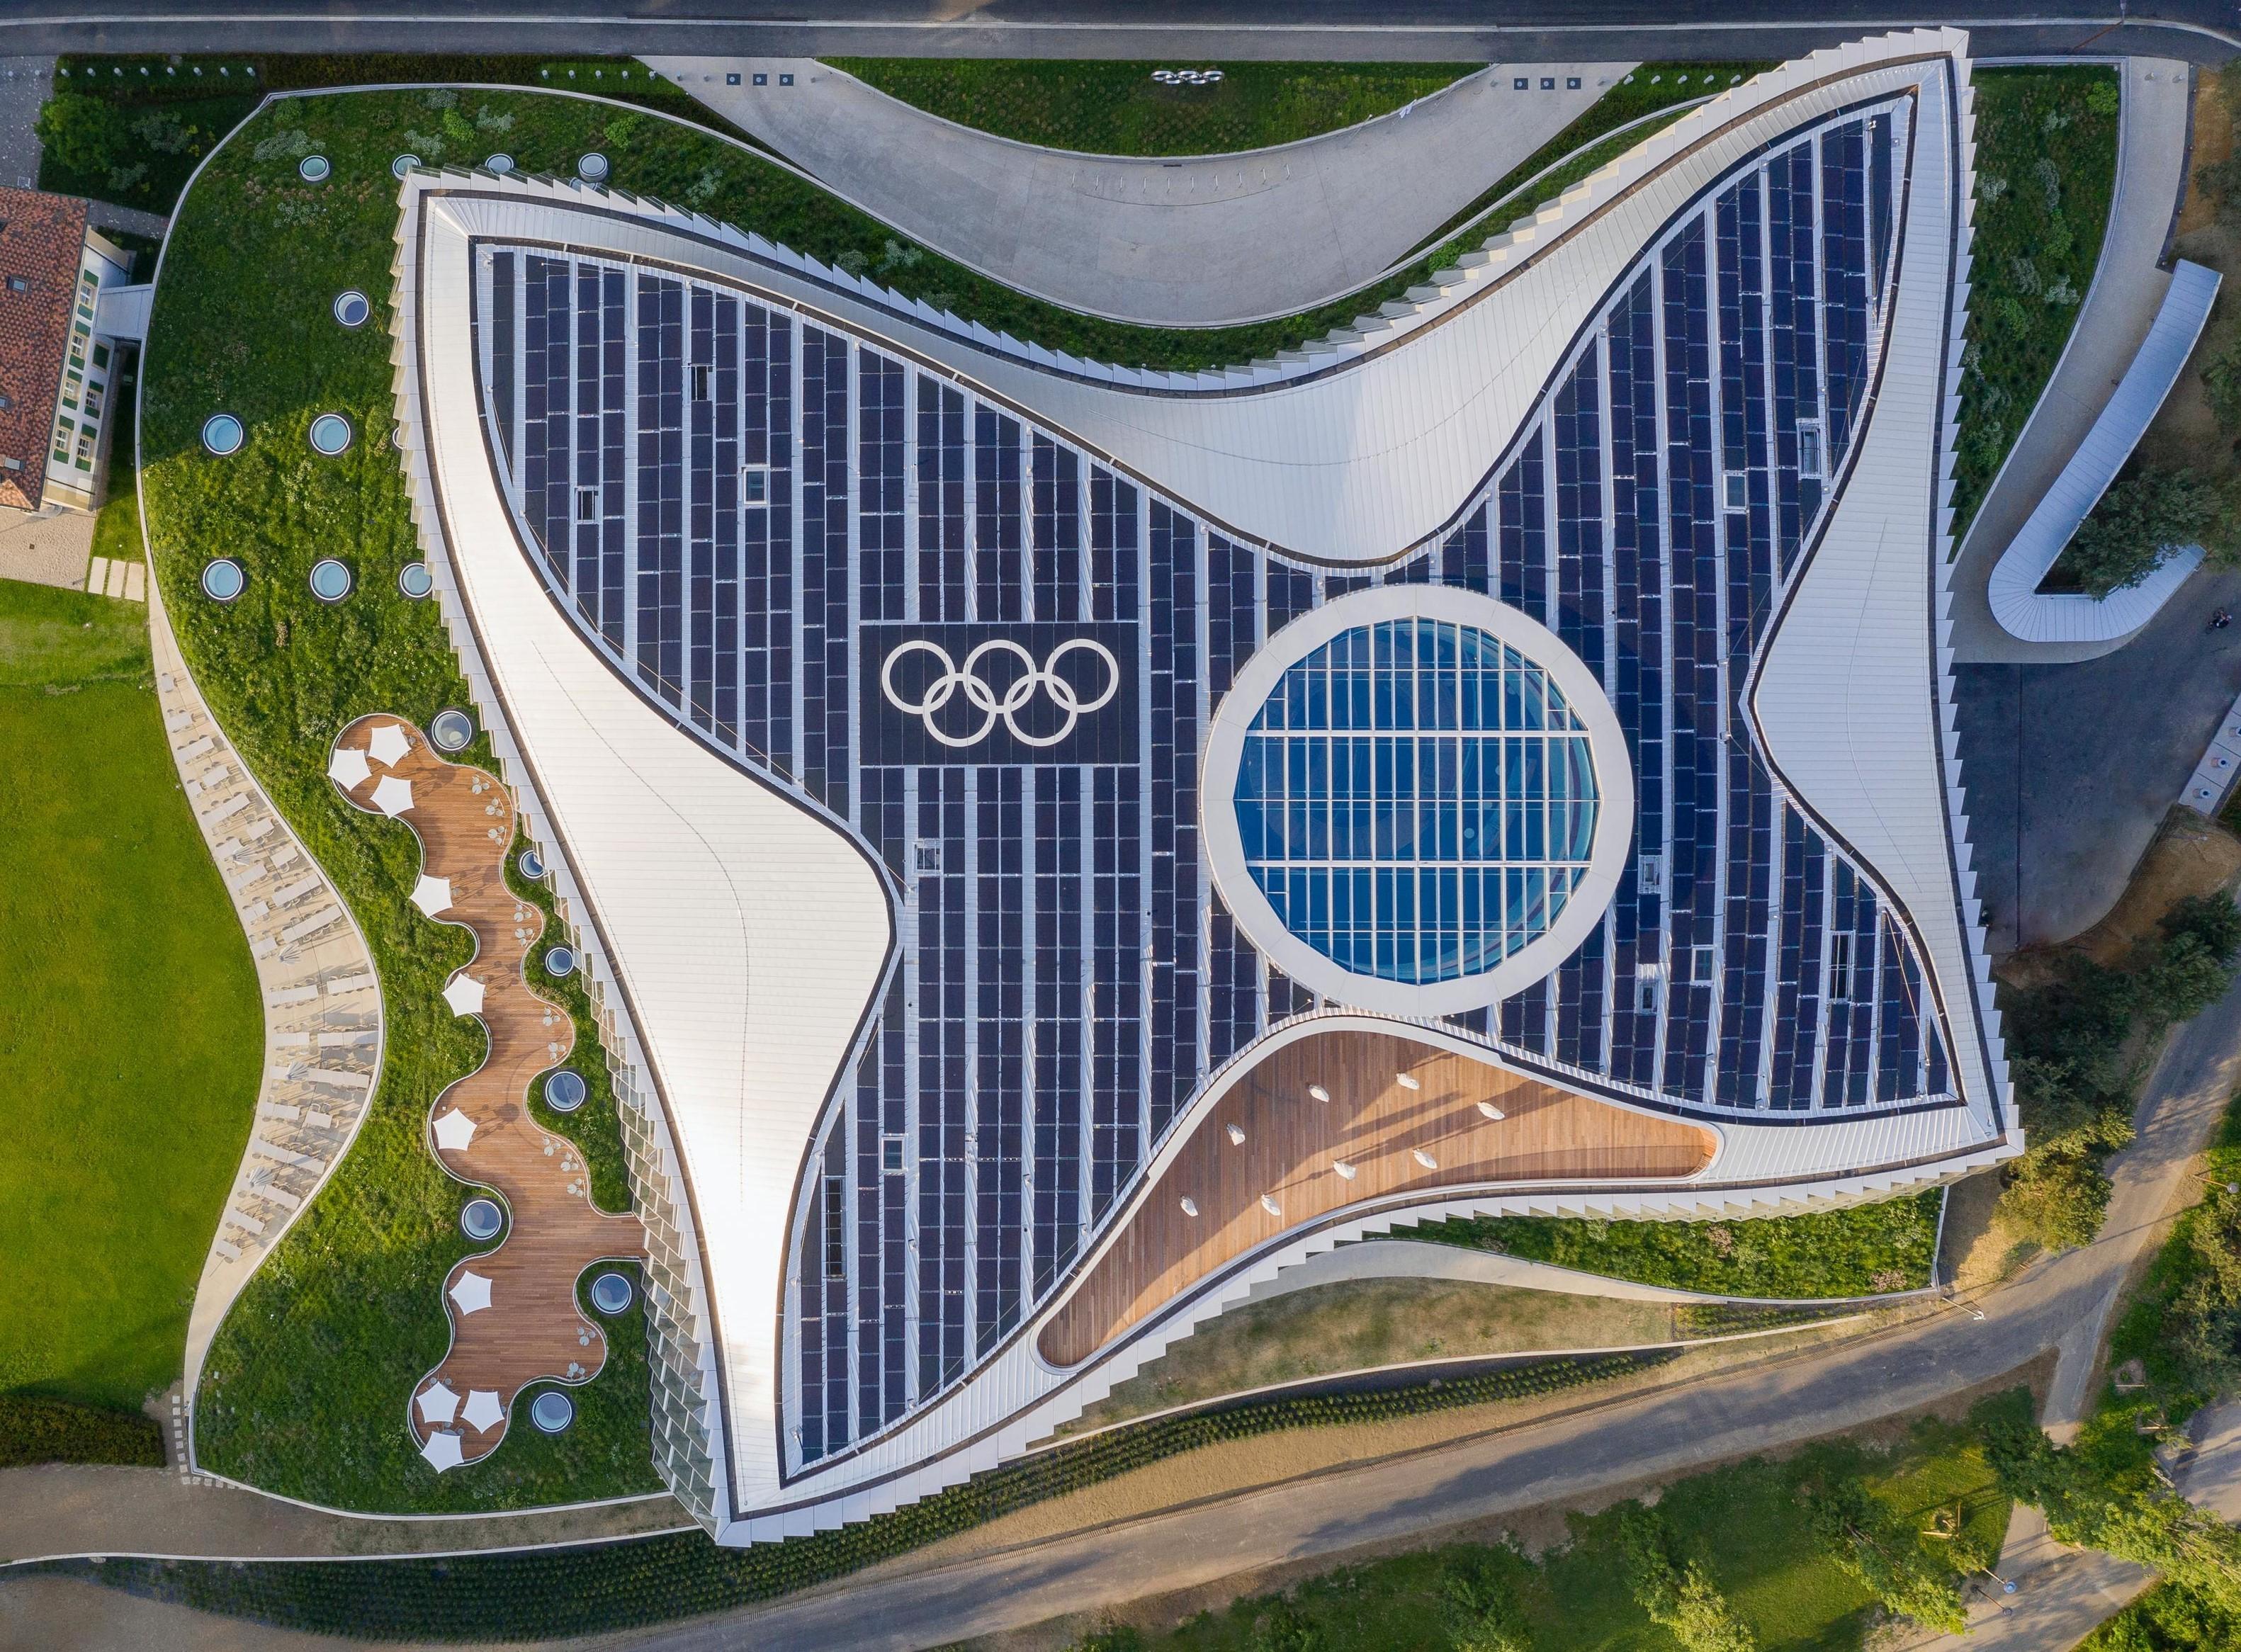 Prix solaire suisse 2021 1